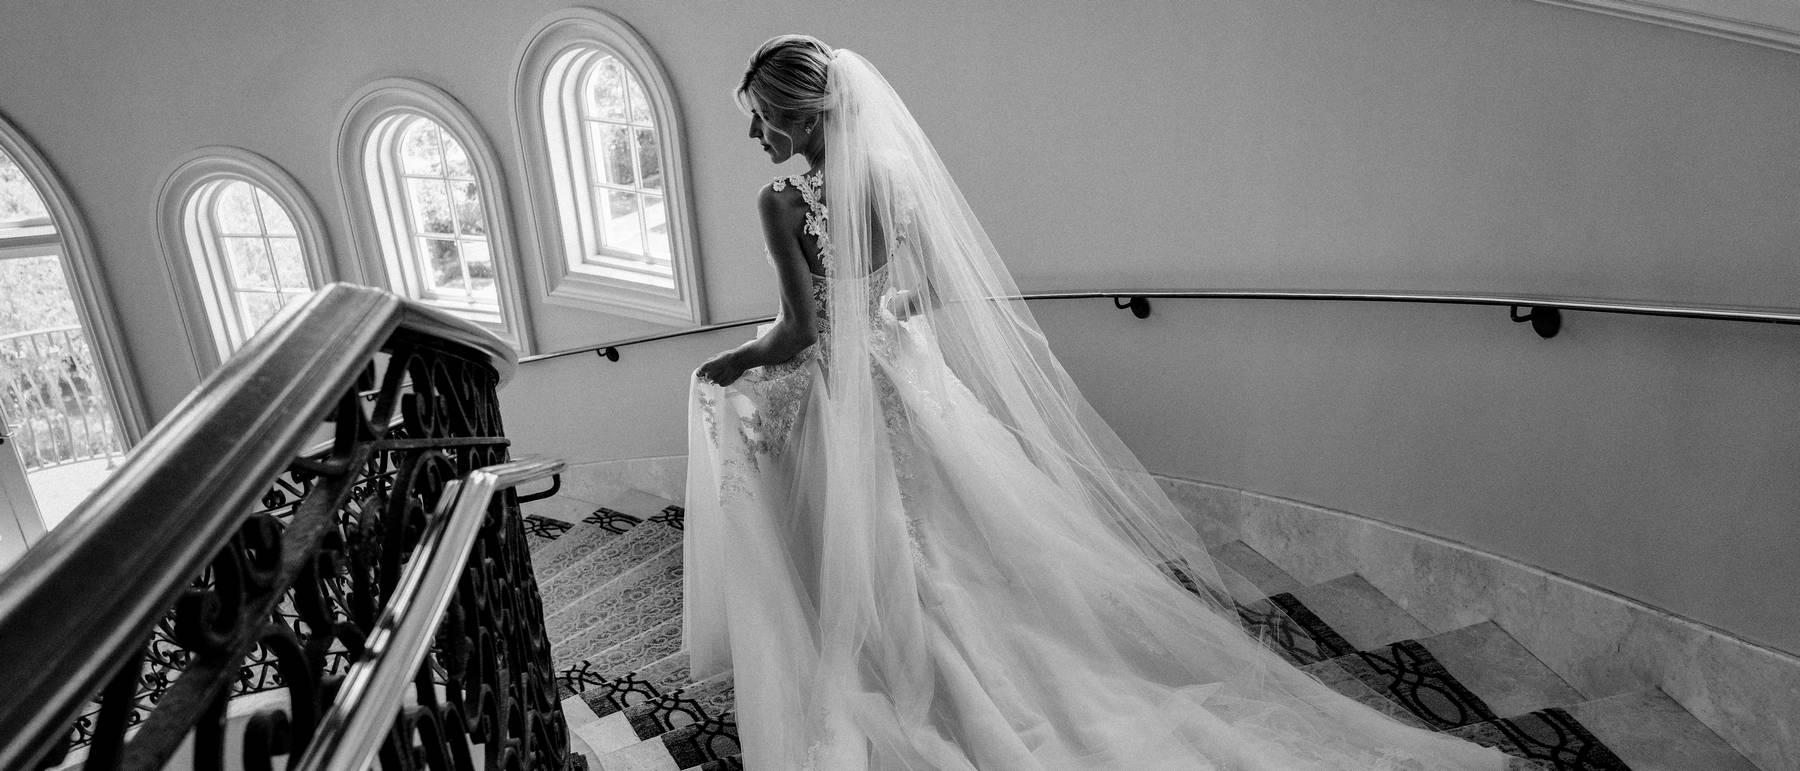 johnandjoseph-wedding-photographer-hz-slider-192